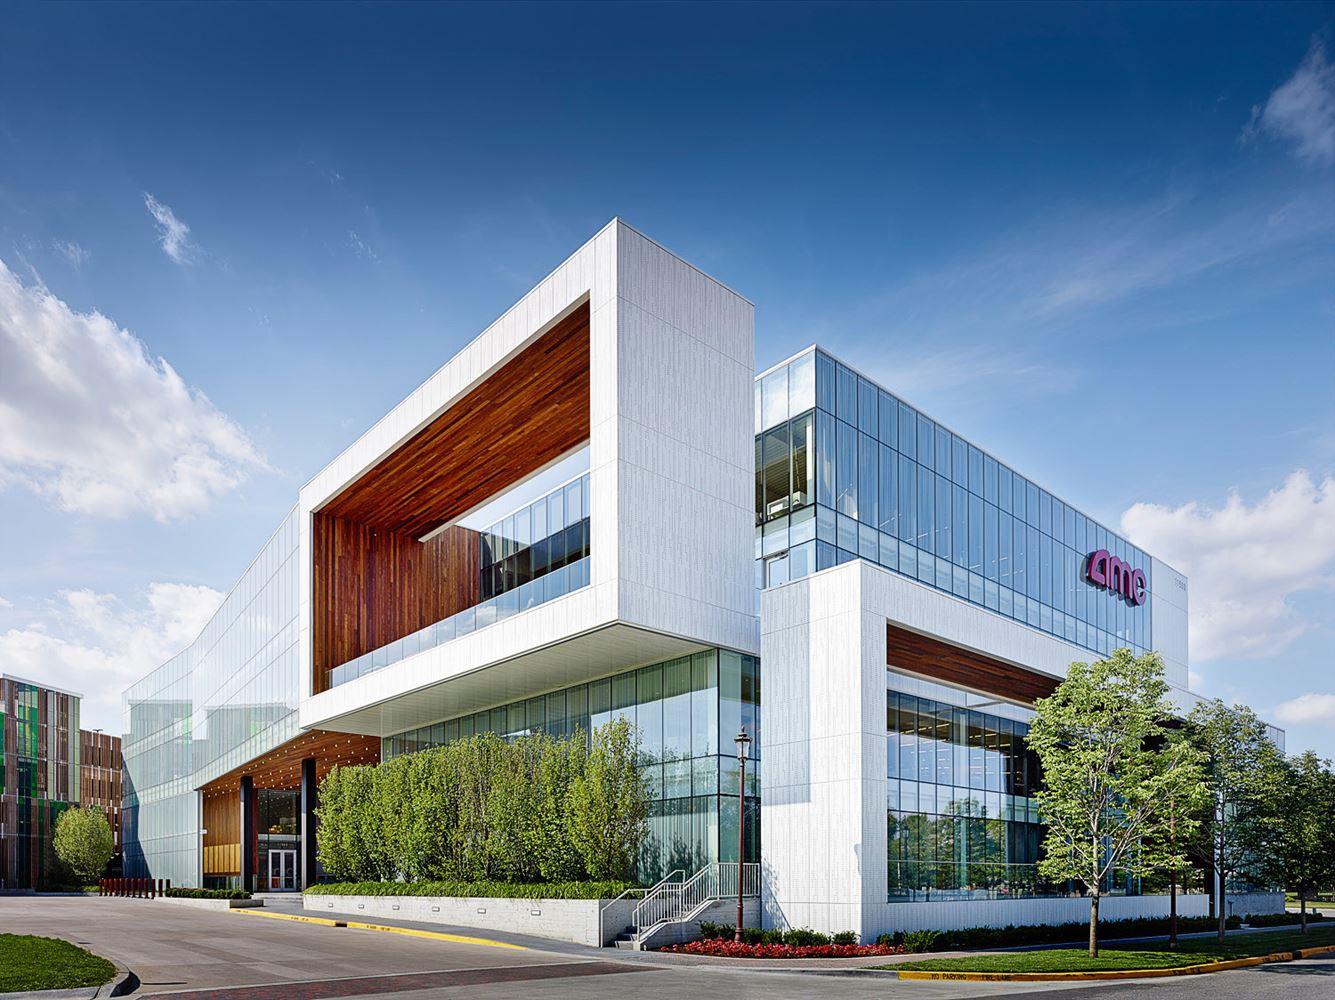 HOK Kansas City Architects - Kansas city architecture firms